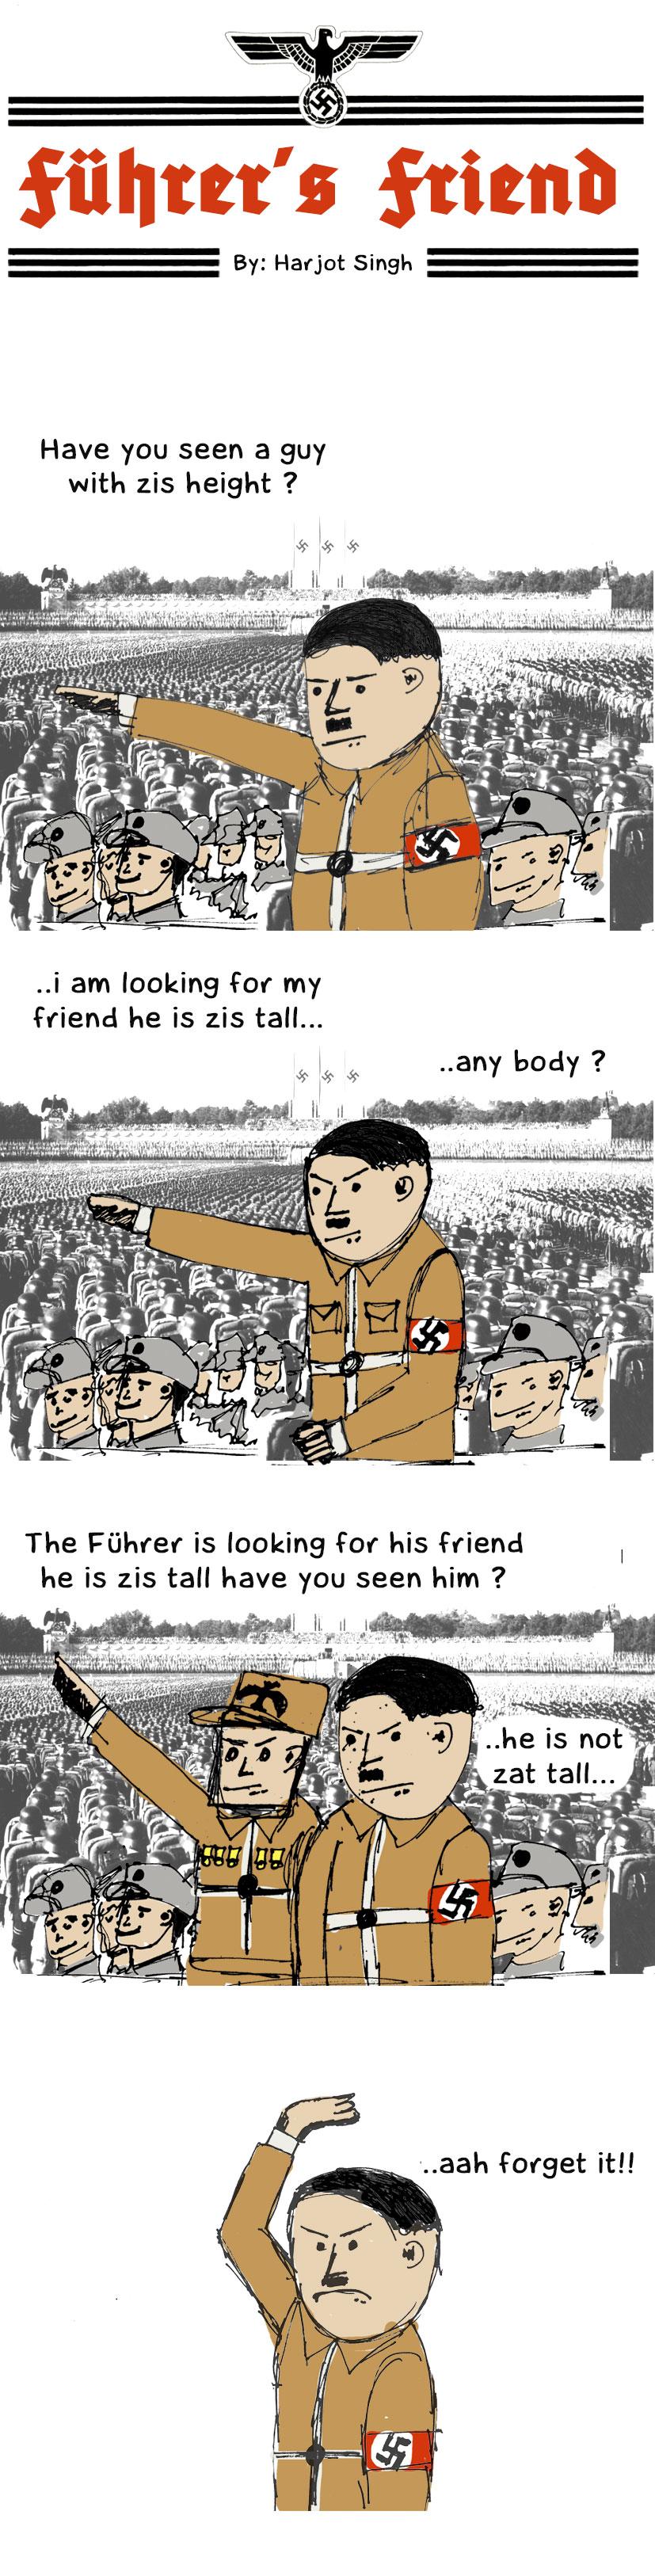 Fuhrer's friend